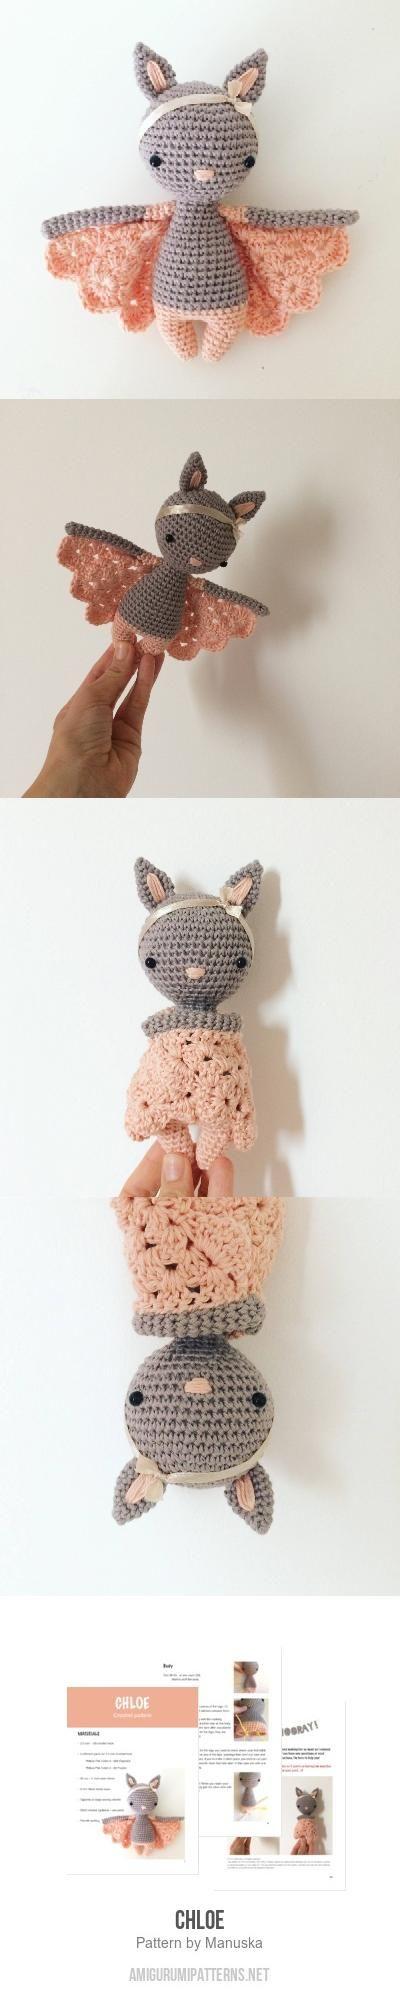 Chloe amigurumi pattern